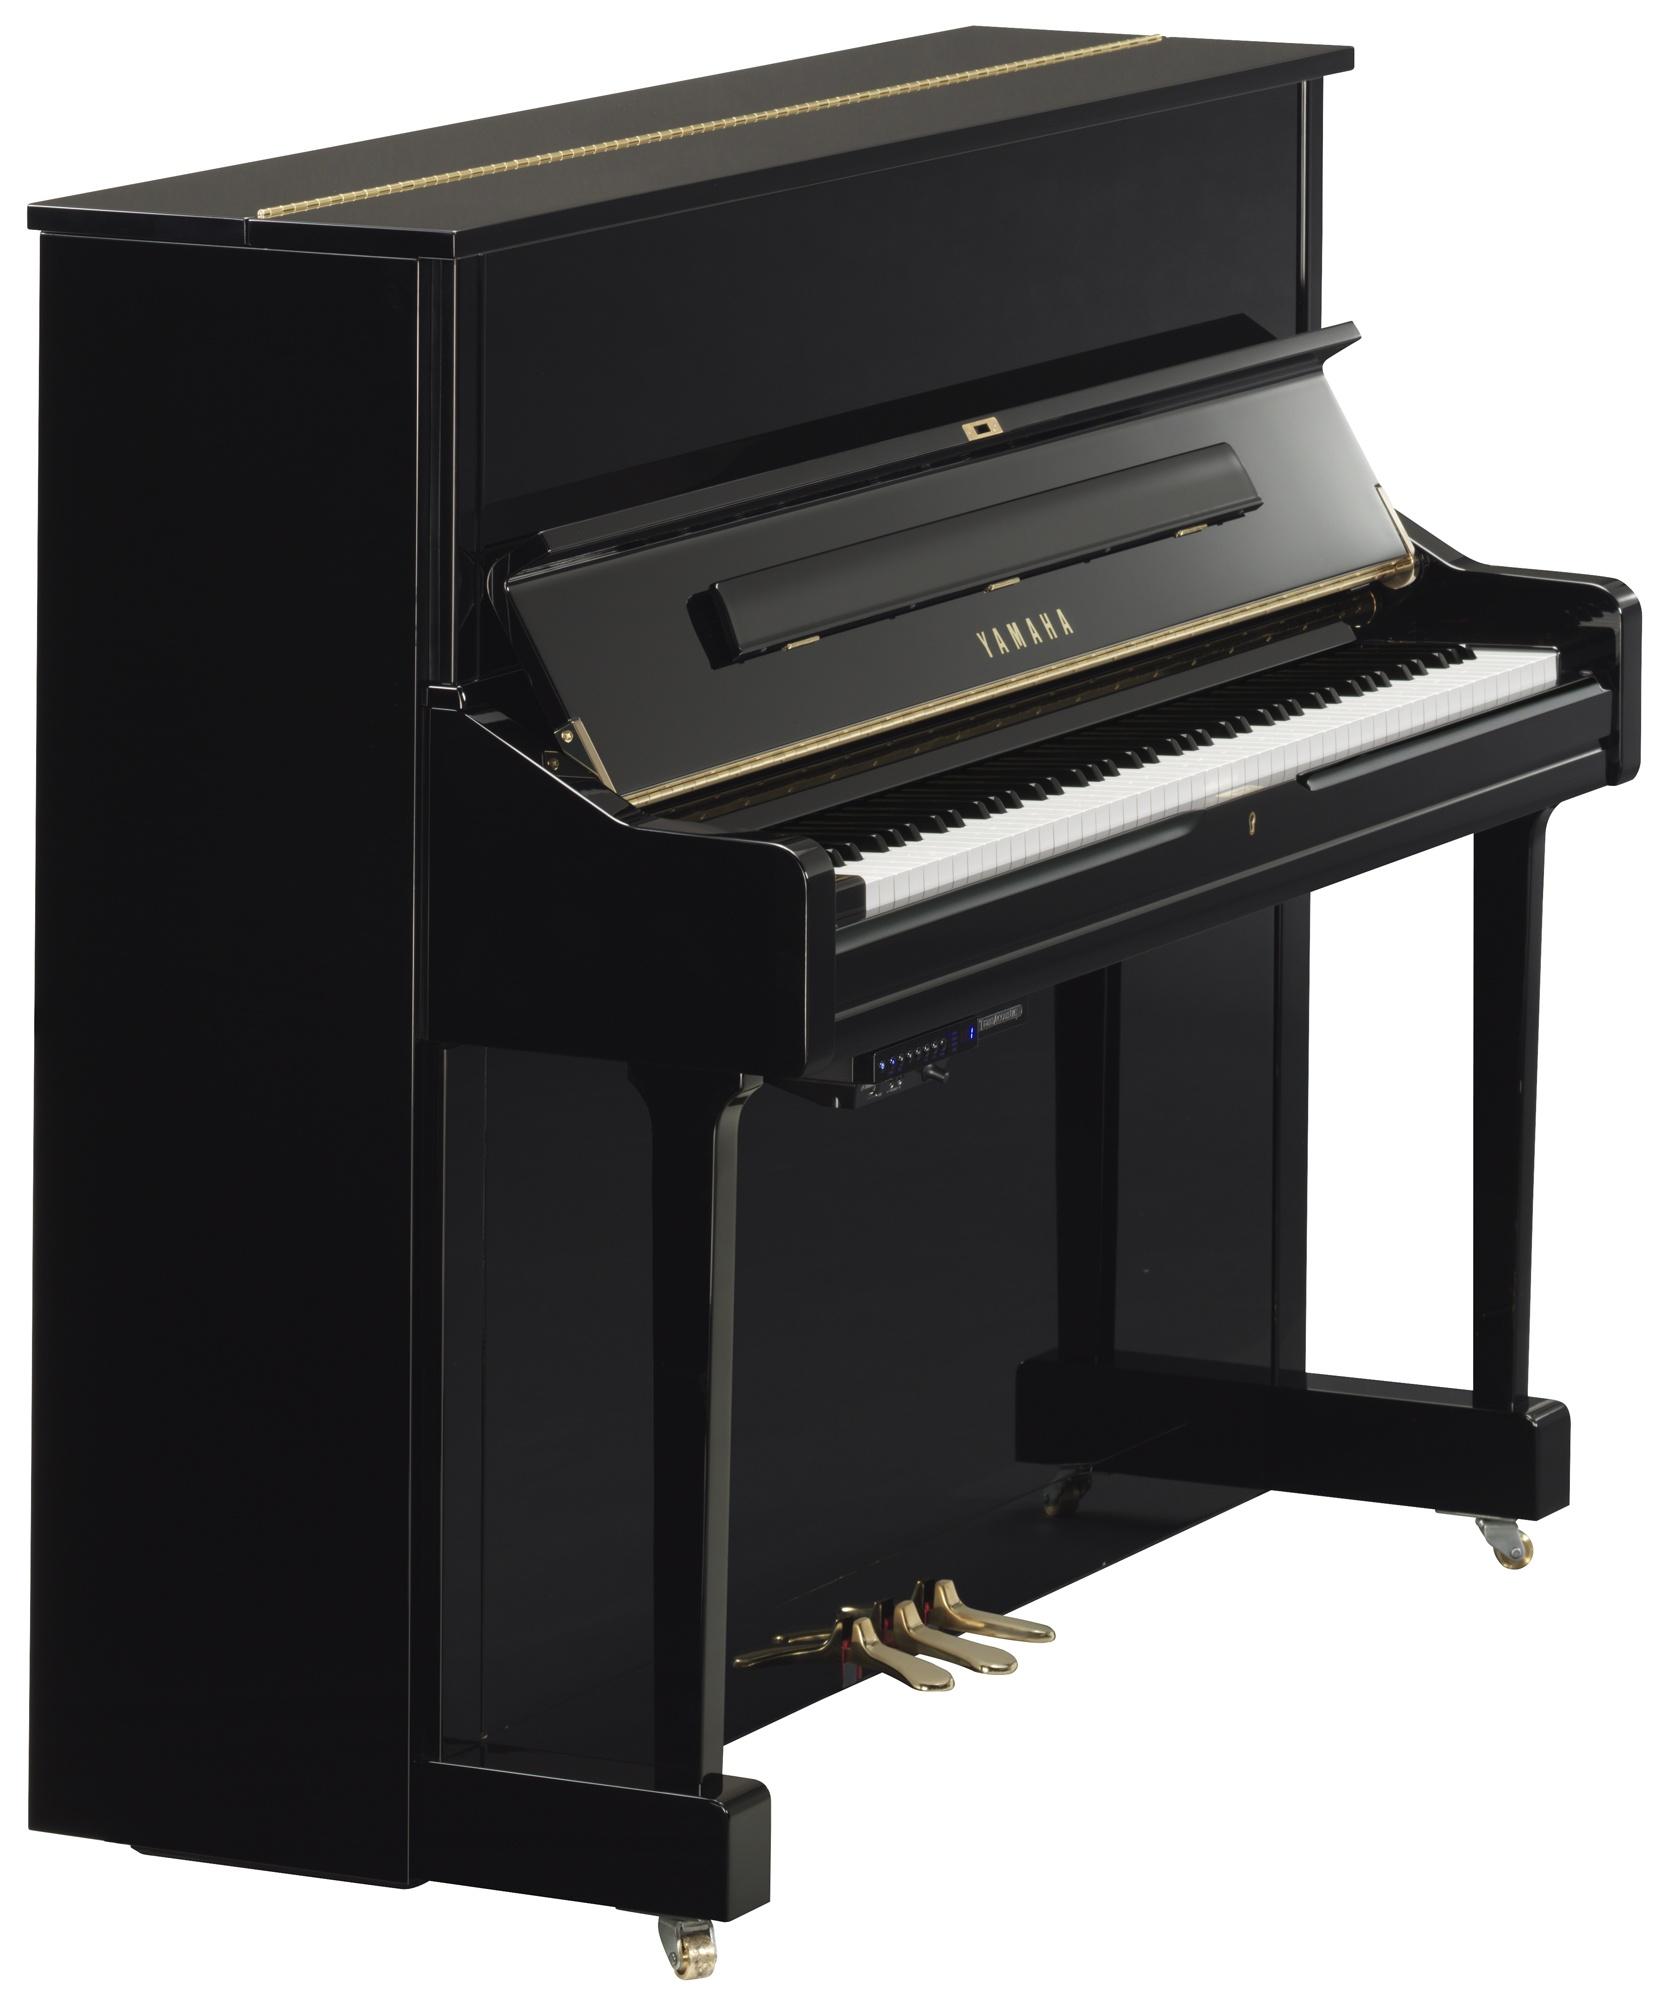 Yamaha Yus Piano